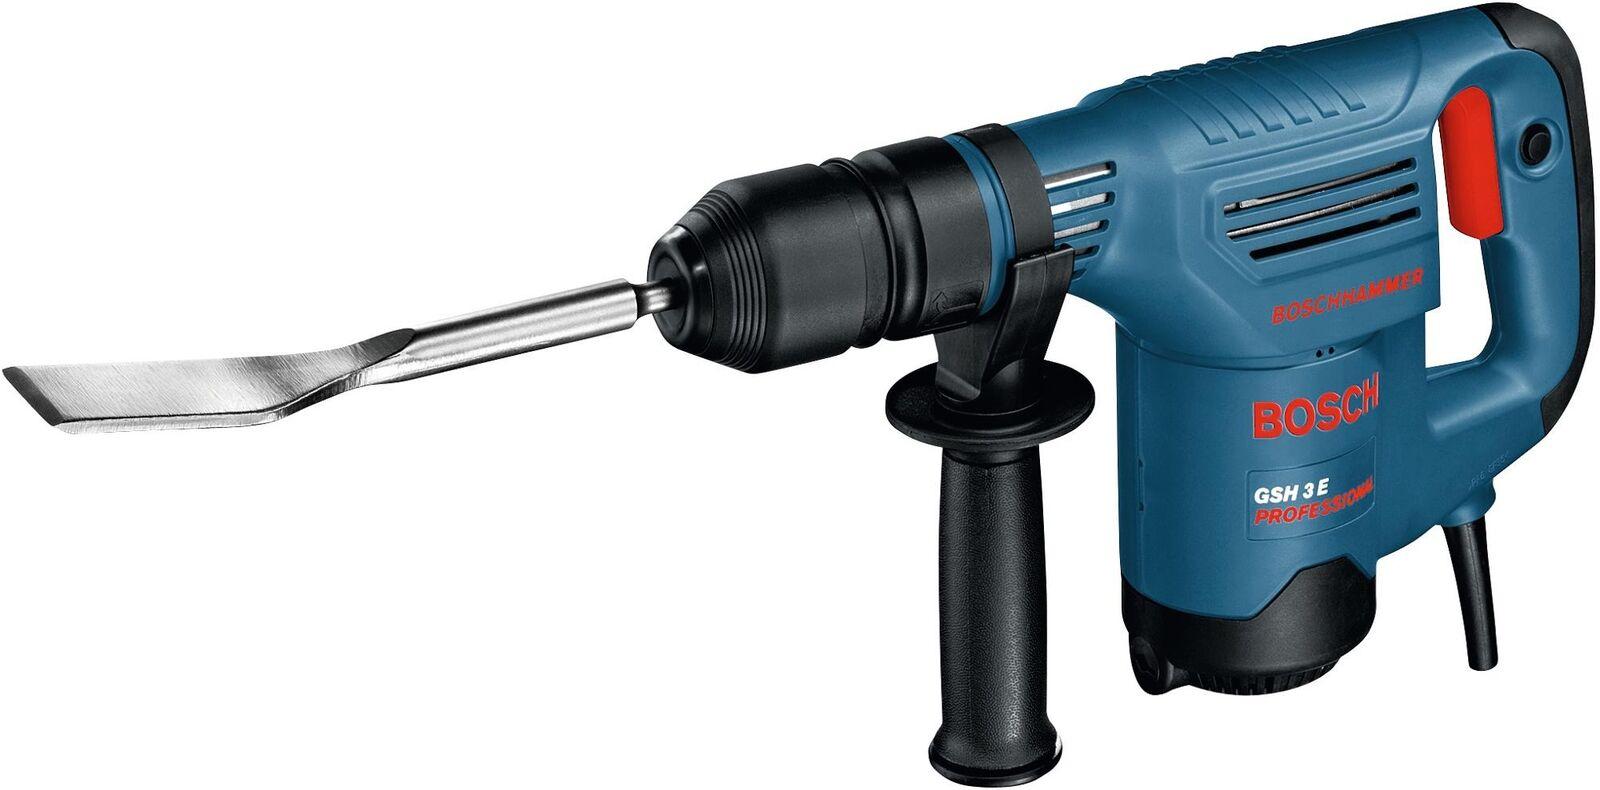 Bosch GSH3E Schlaghammer 0611320703 Handwerkerkoffer & 2x Meißel